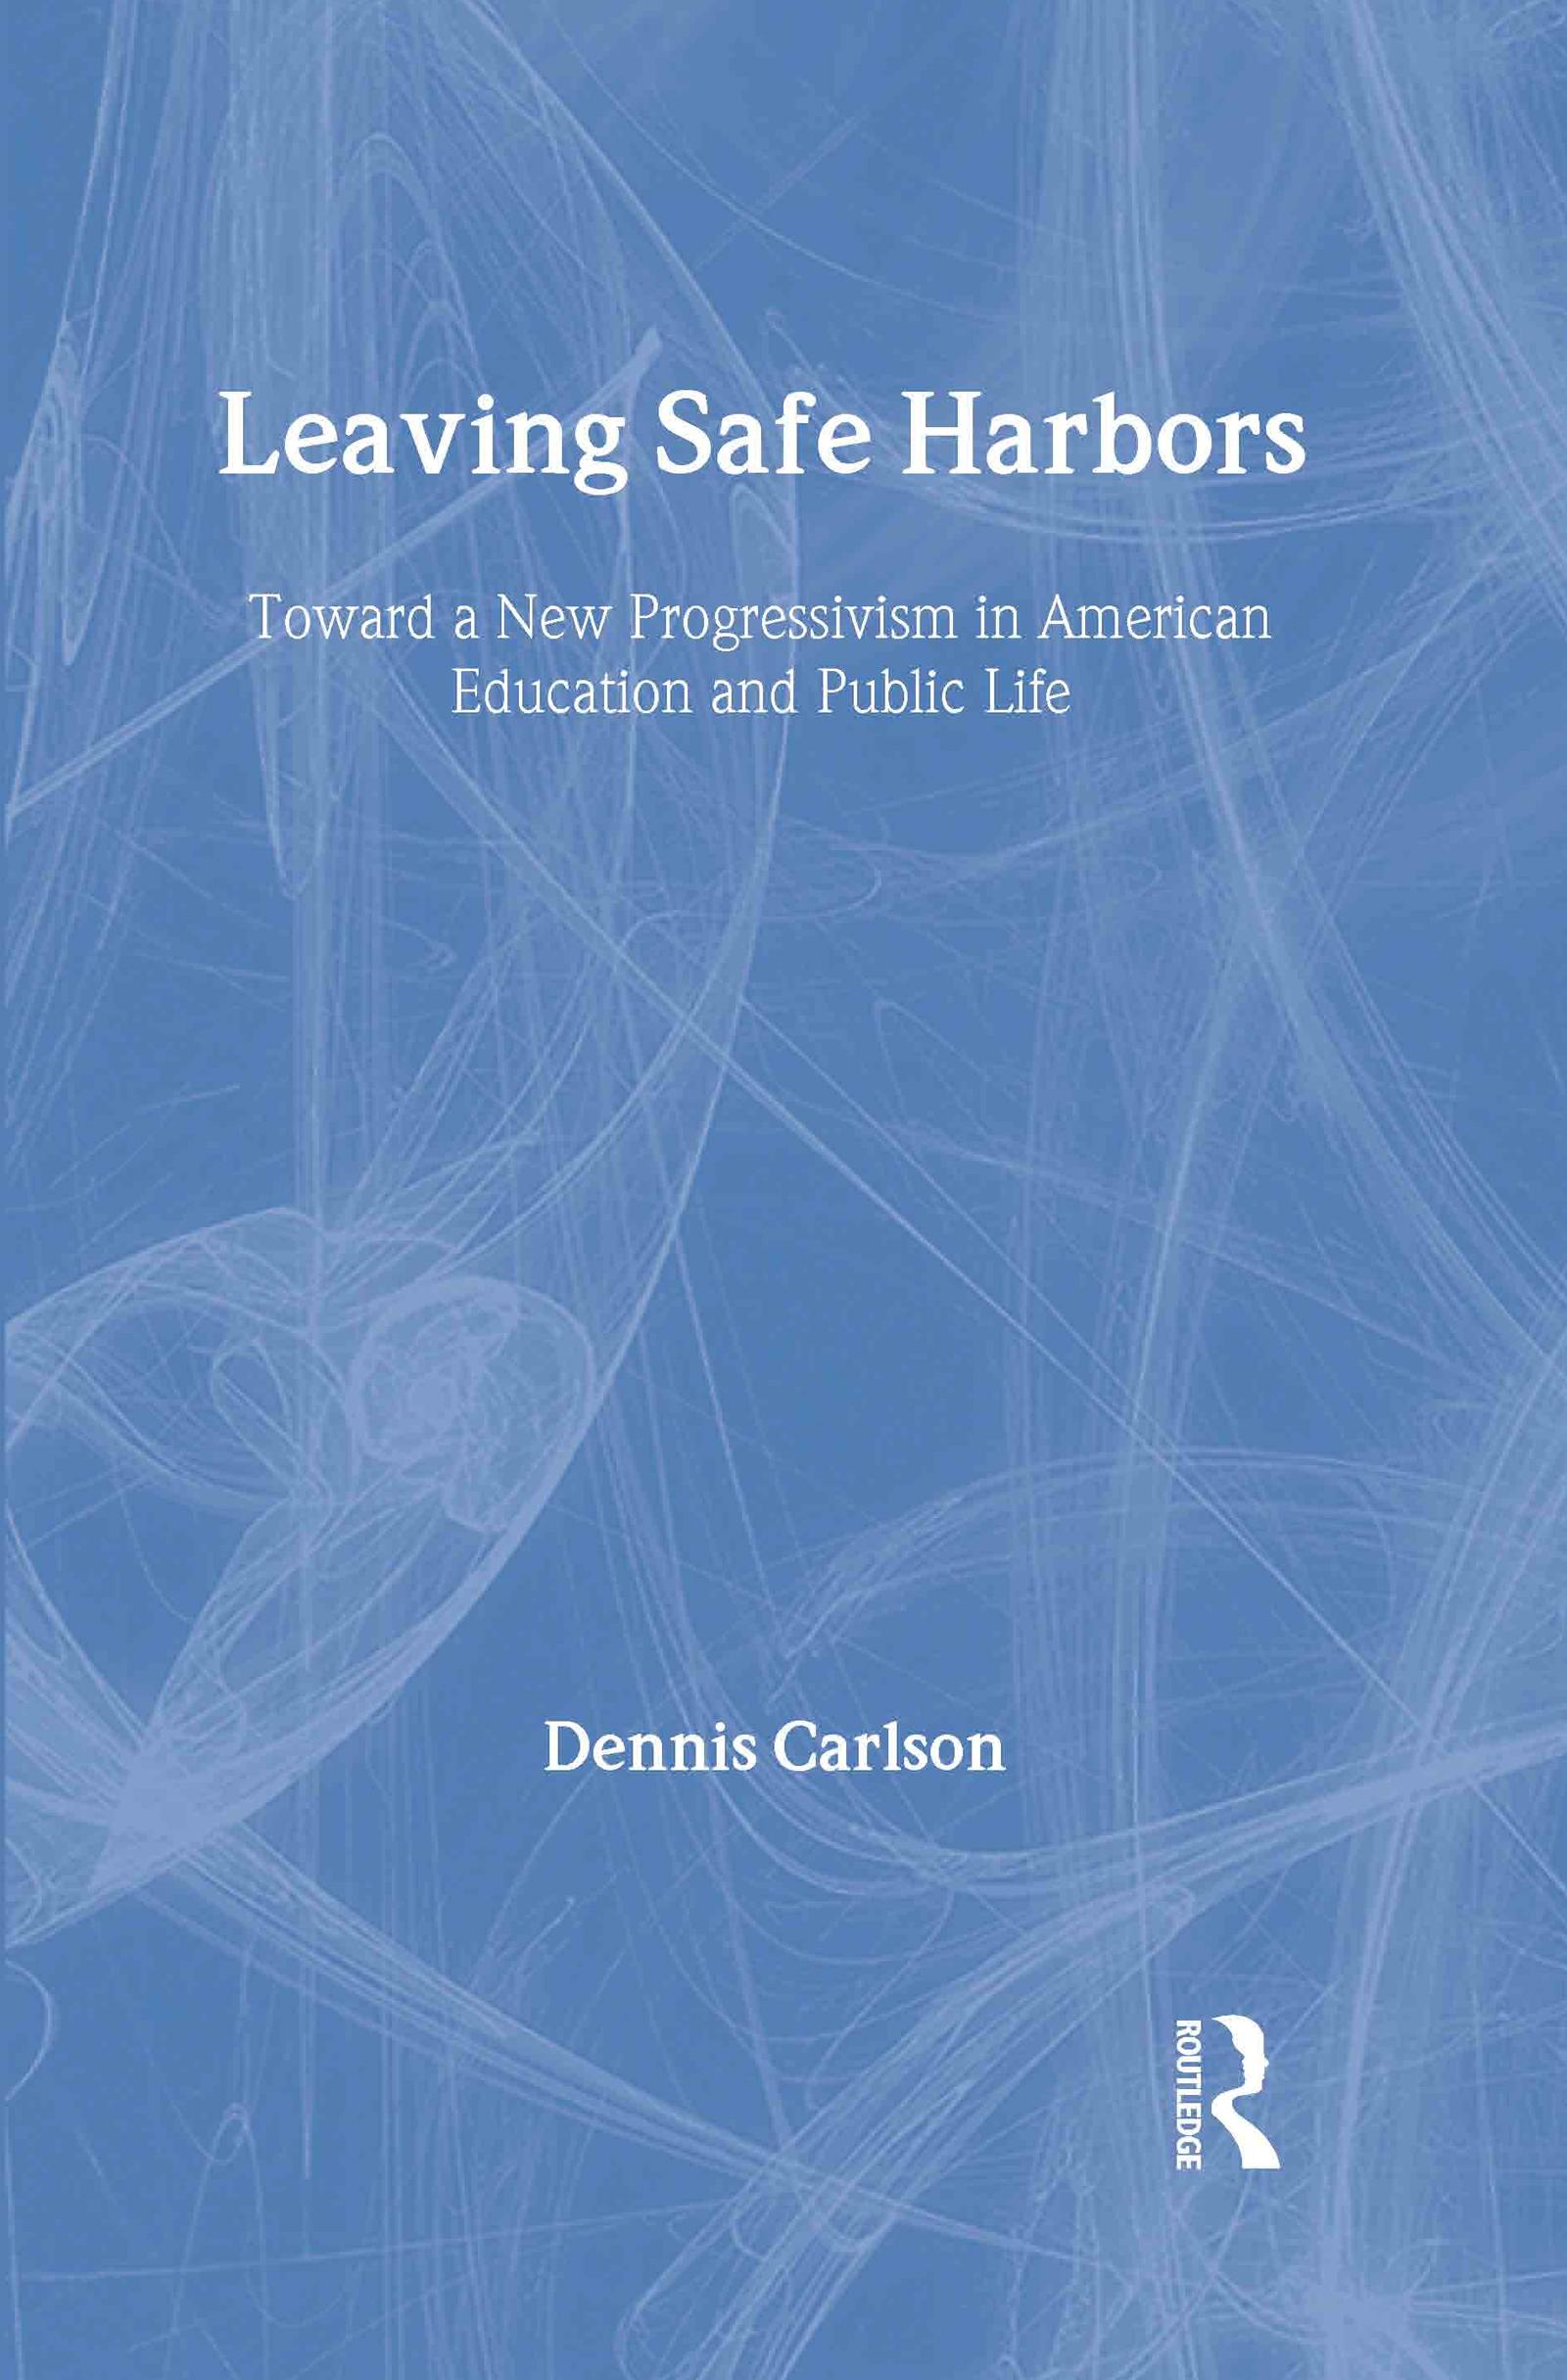 Leaving Safe Harbors